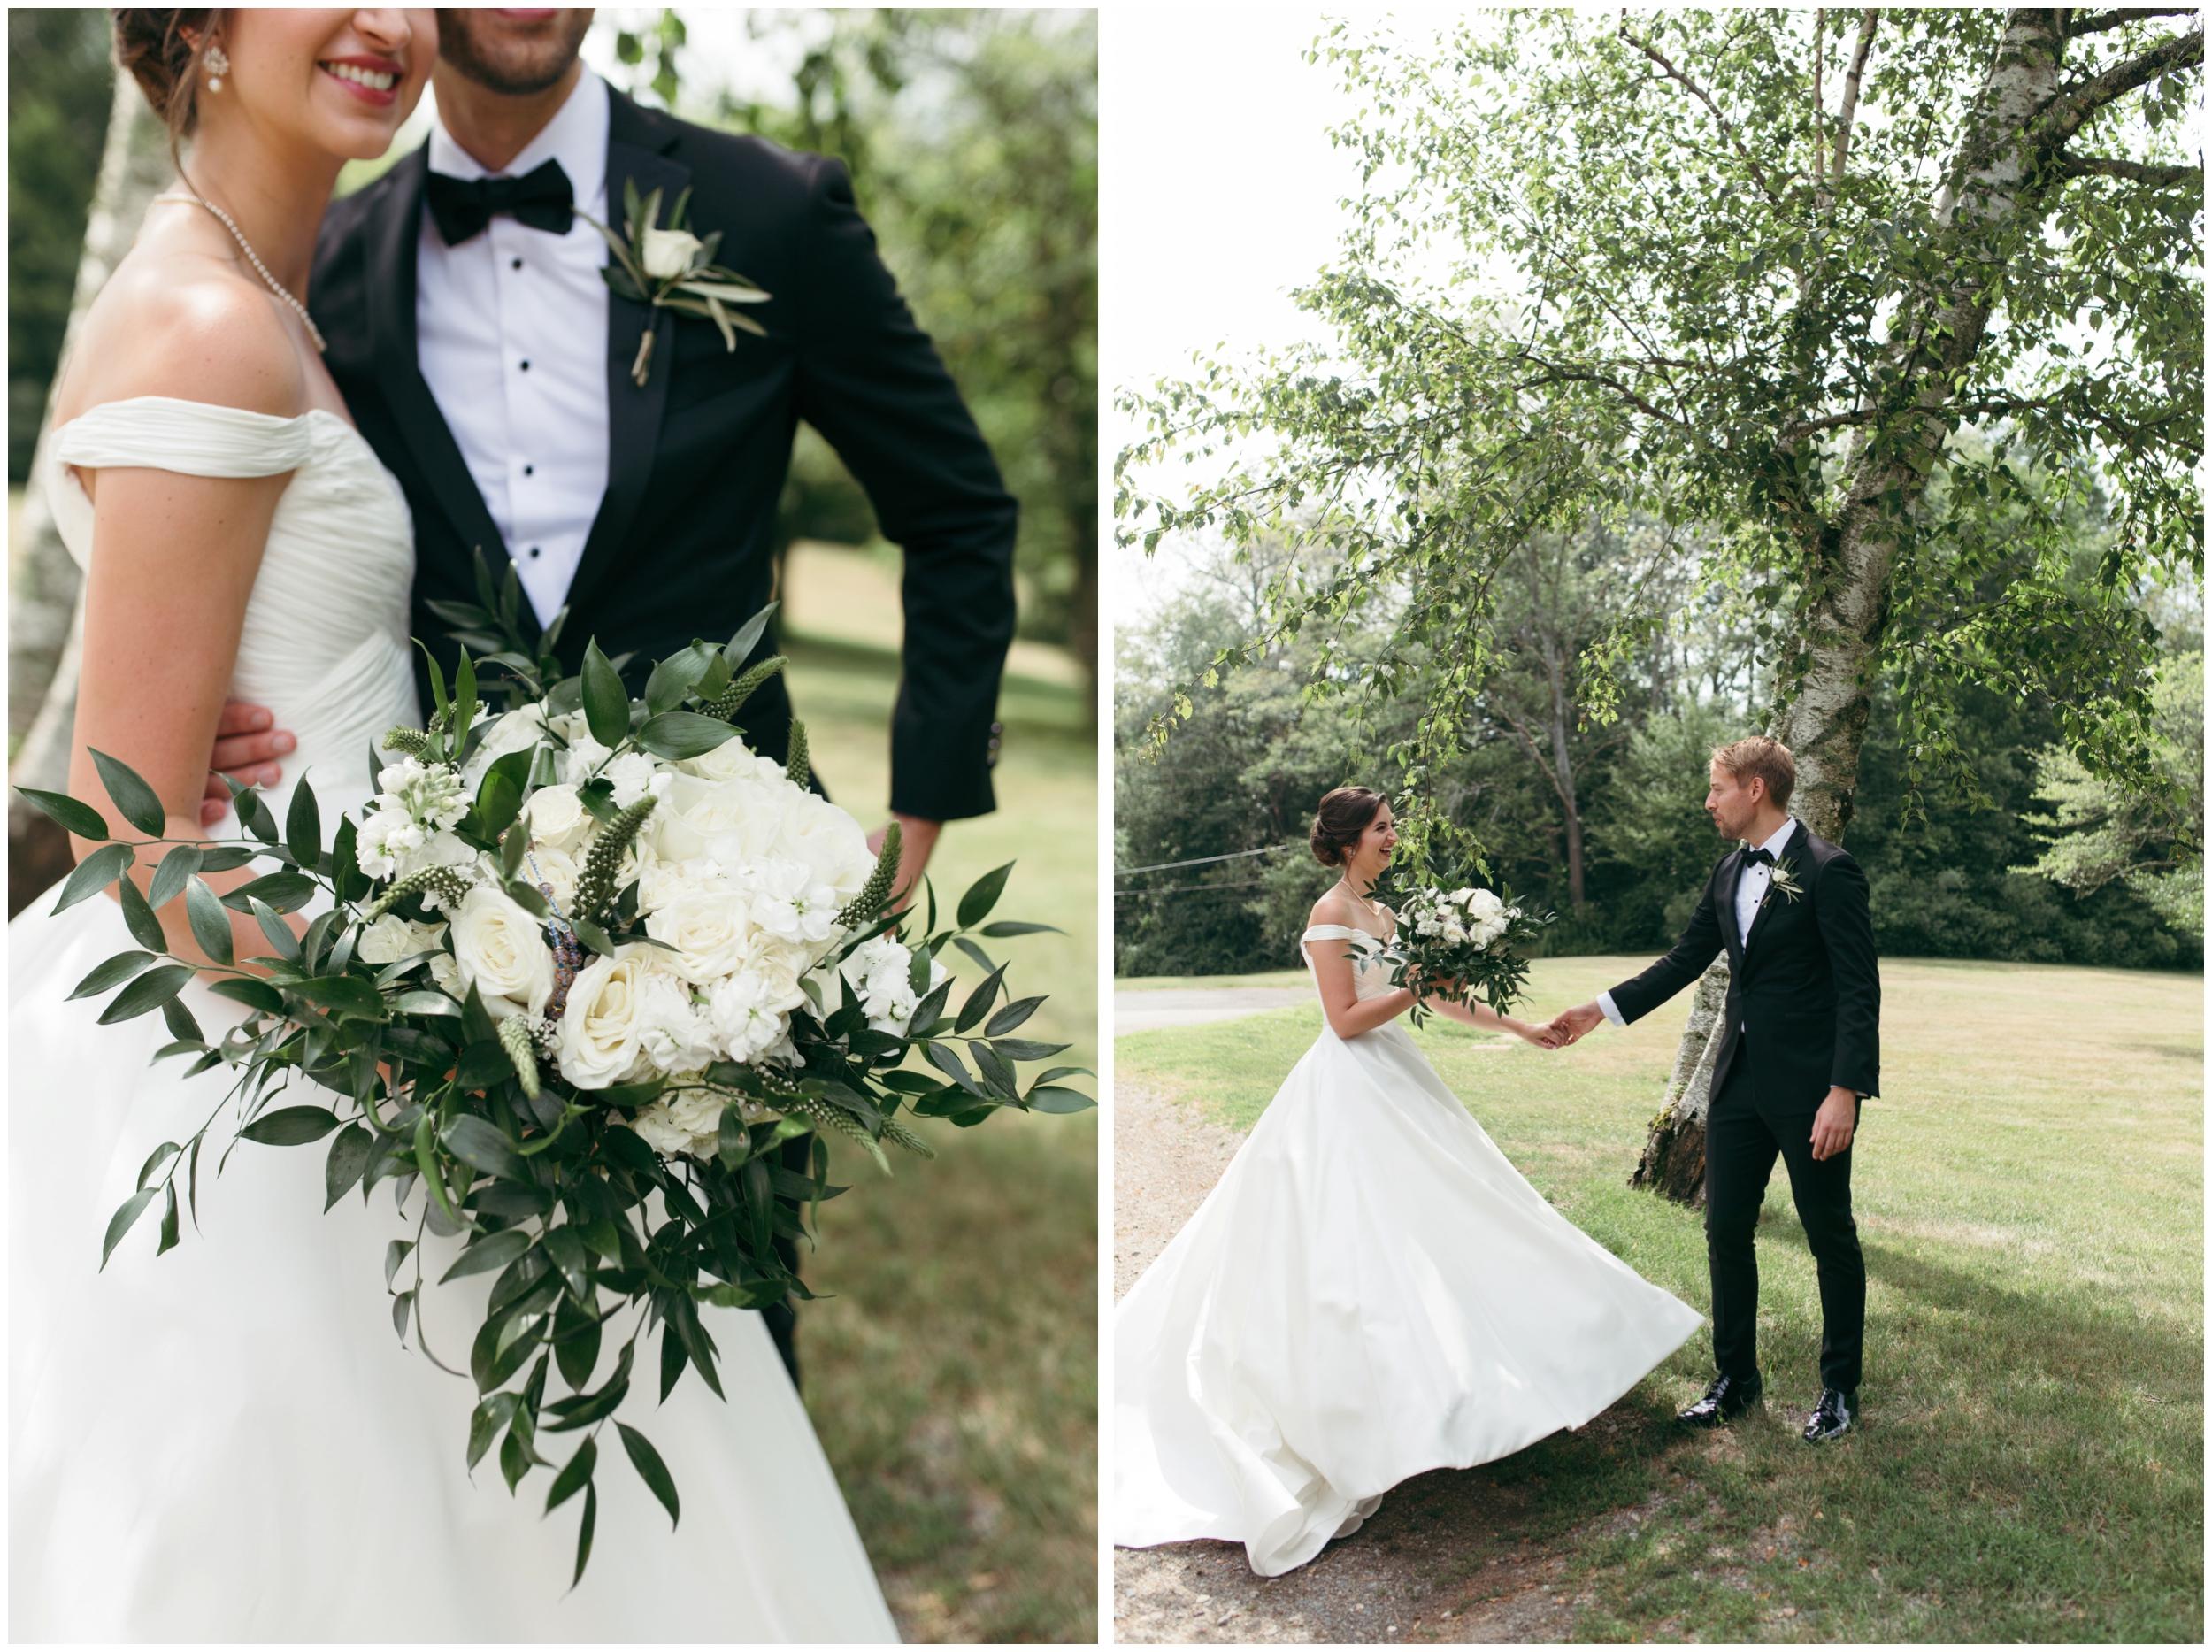 Willowdale-Estate-Wedding-Bailey-Q-Photo-Boston-Wedding-Photographer-013.JPG